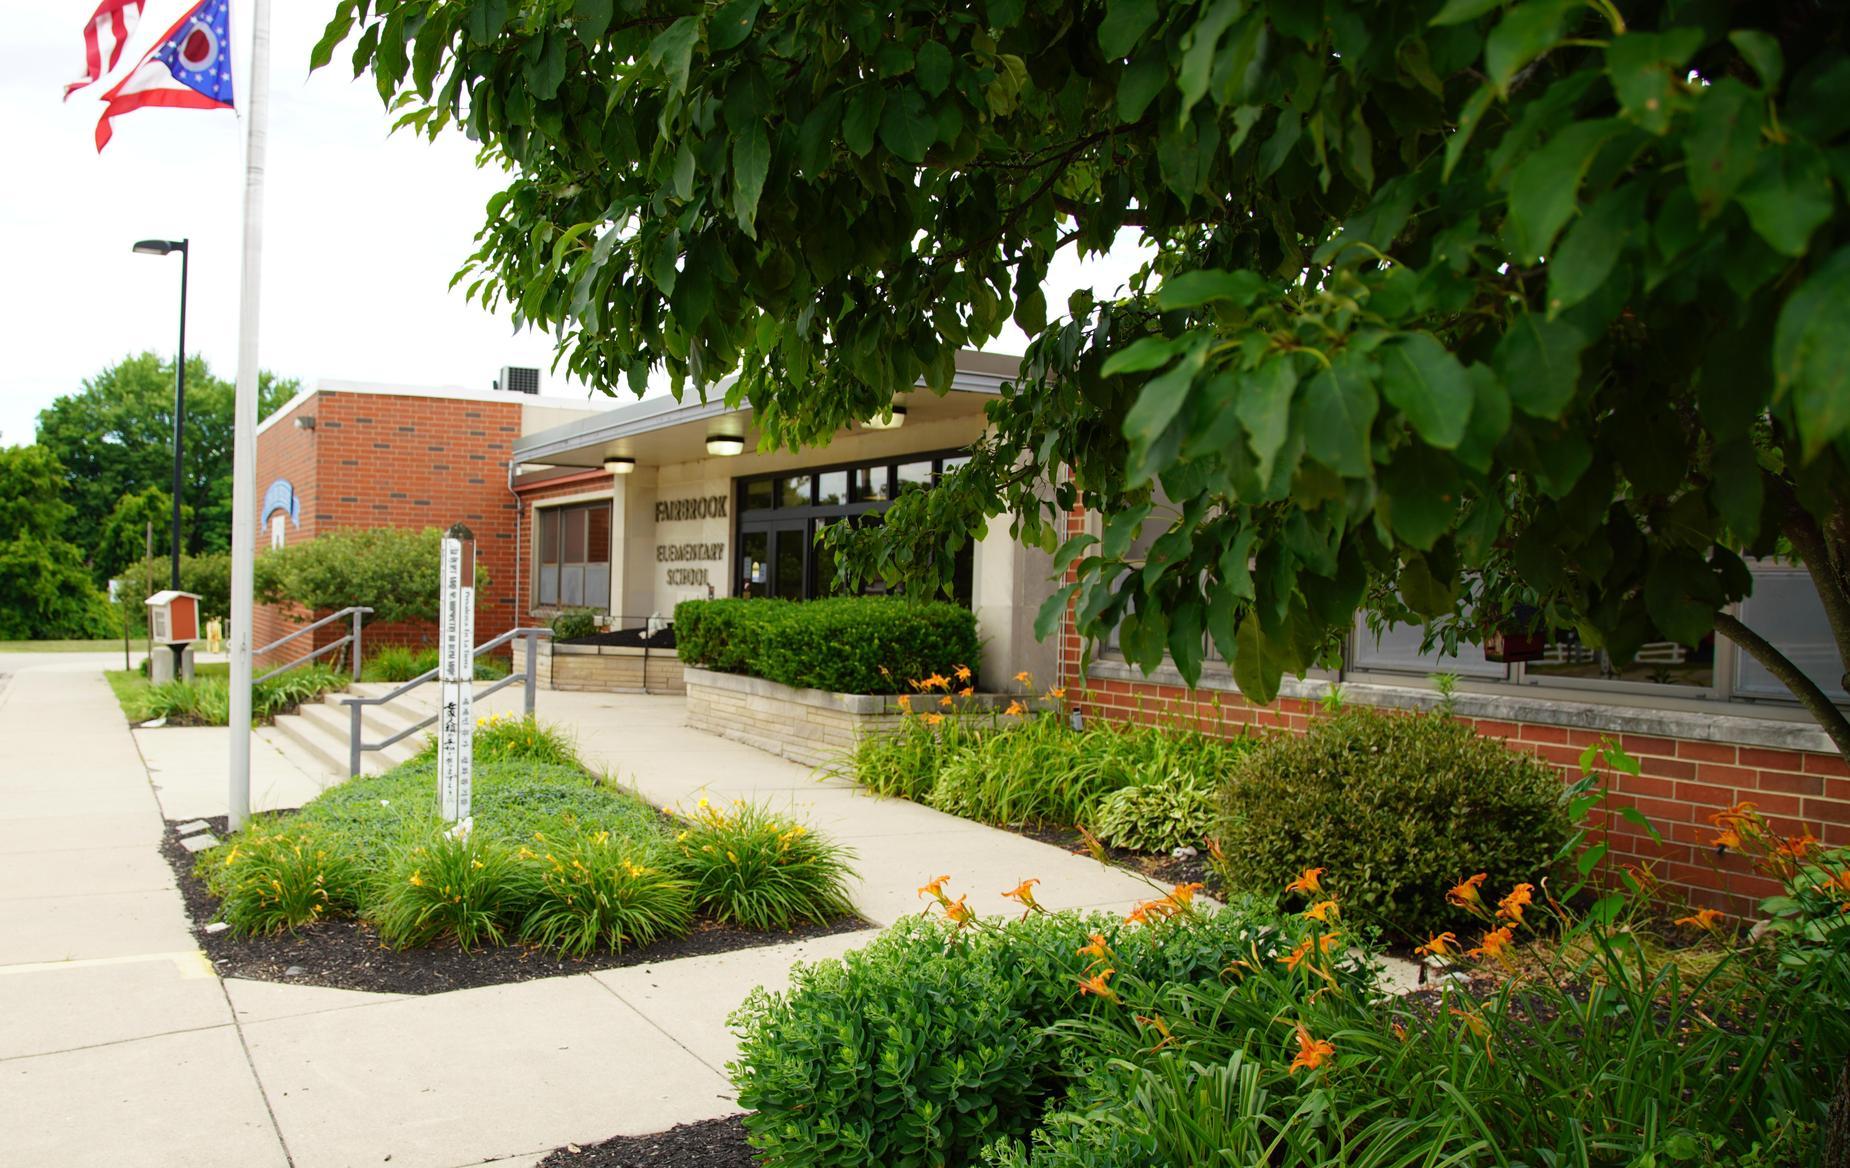 Fairbrook Elementary School